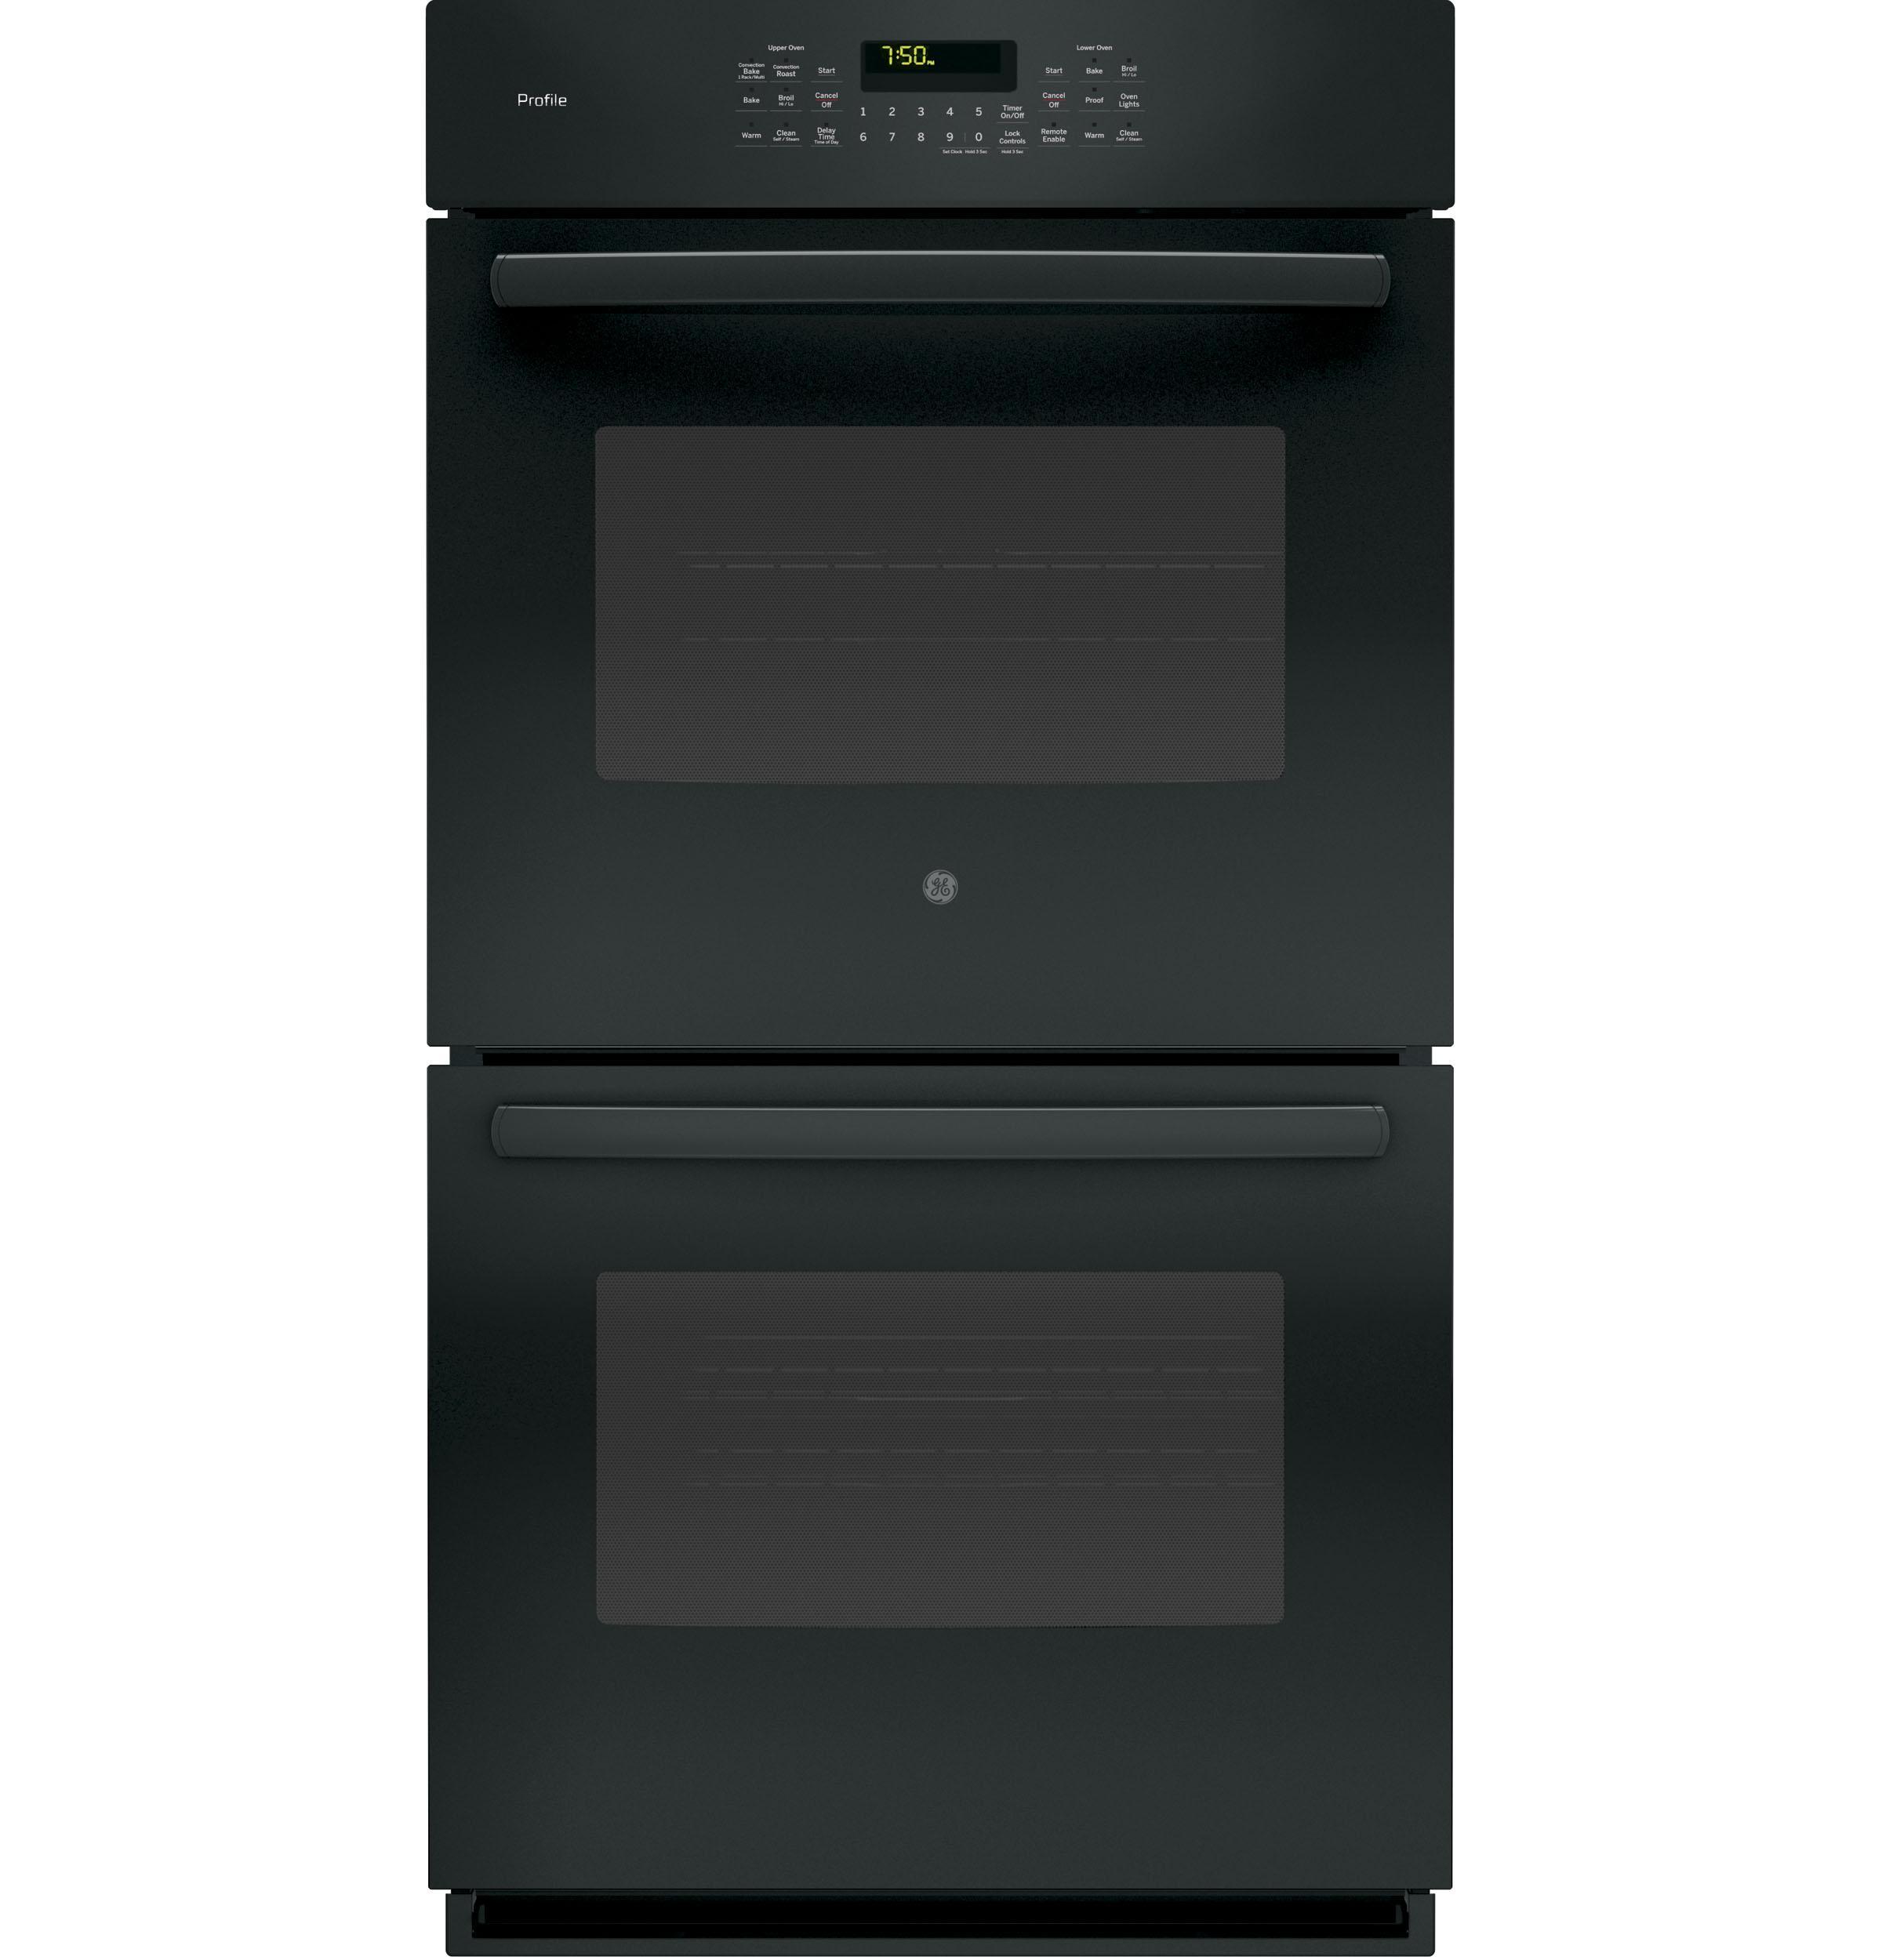 wall ovens appliances electronics buy appliances and electronics online      rh   hhgregg com